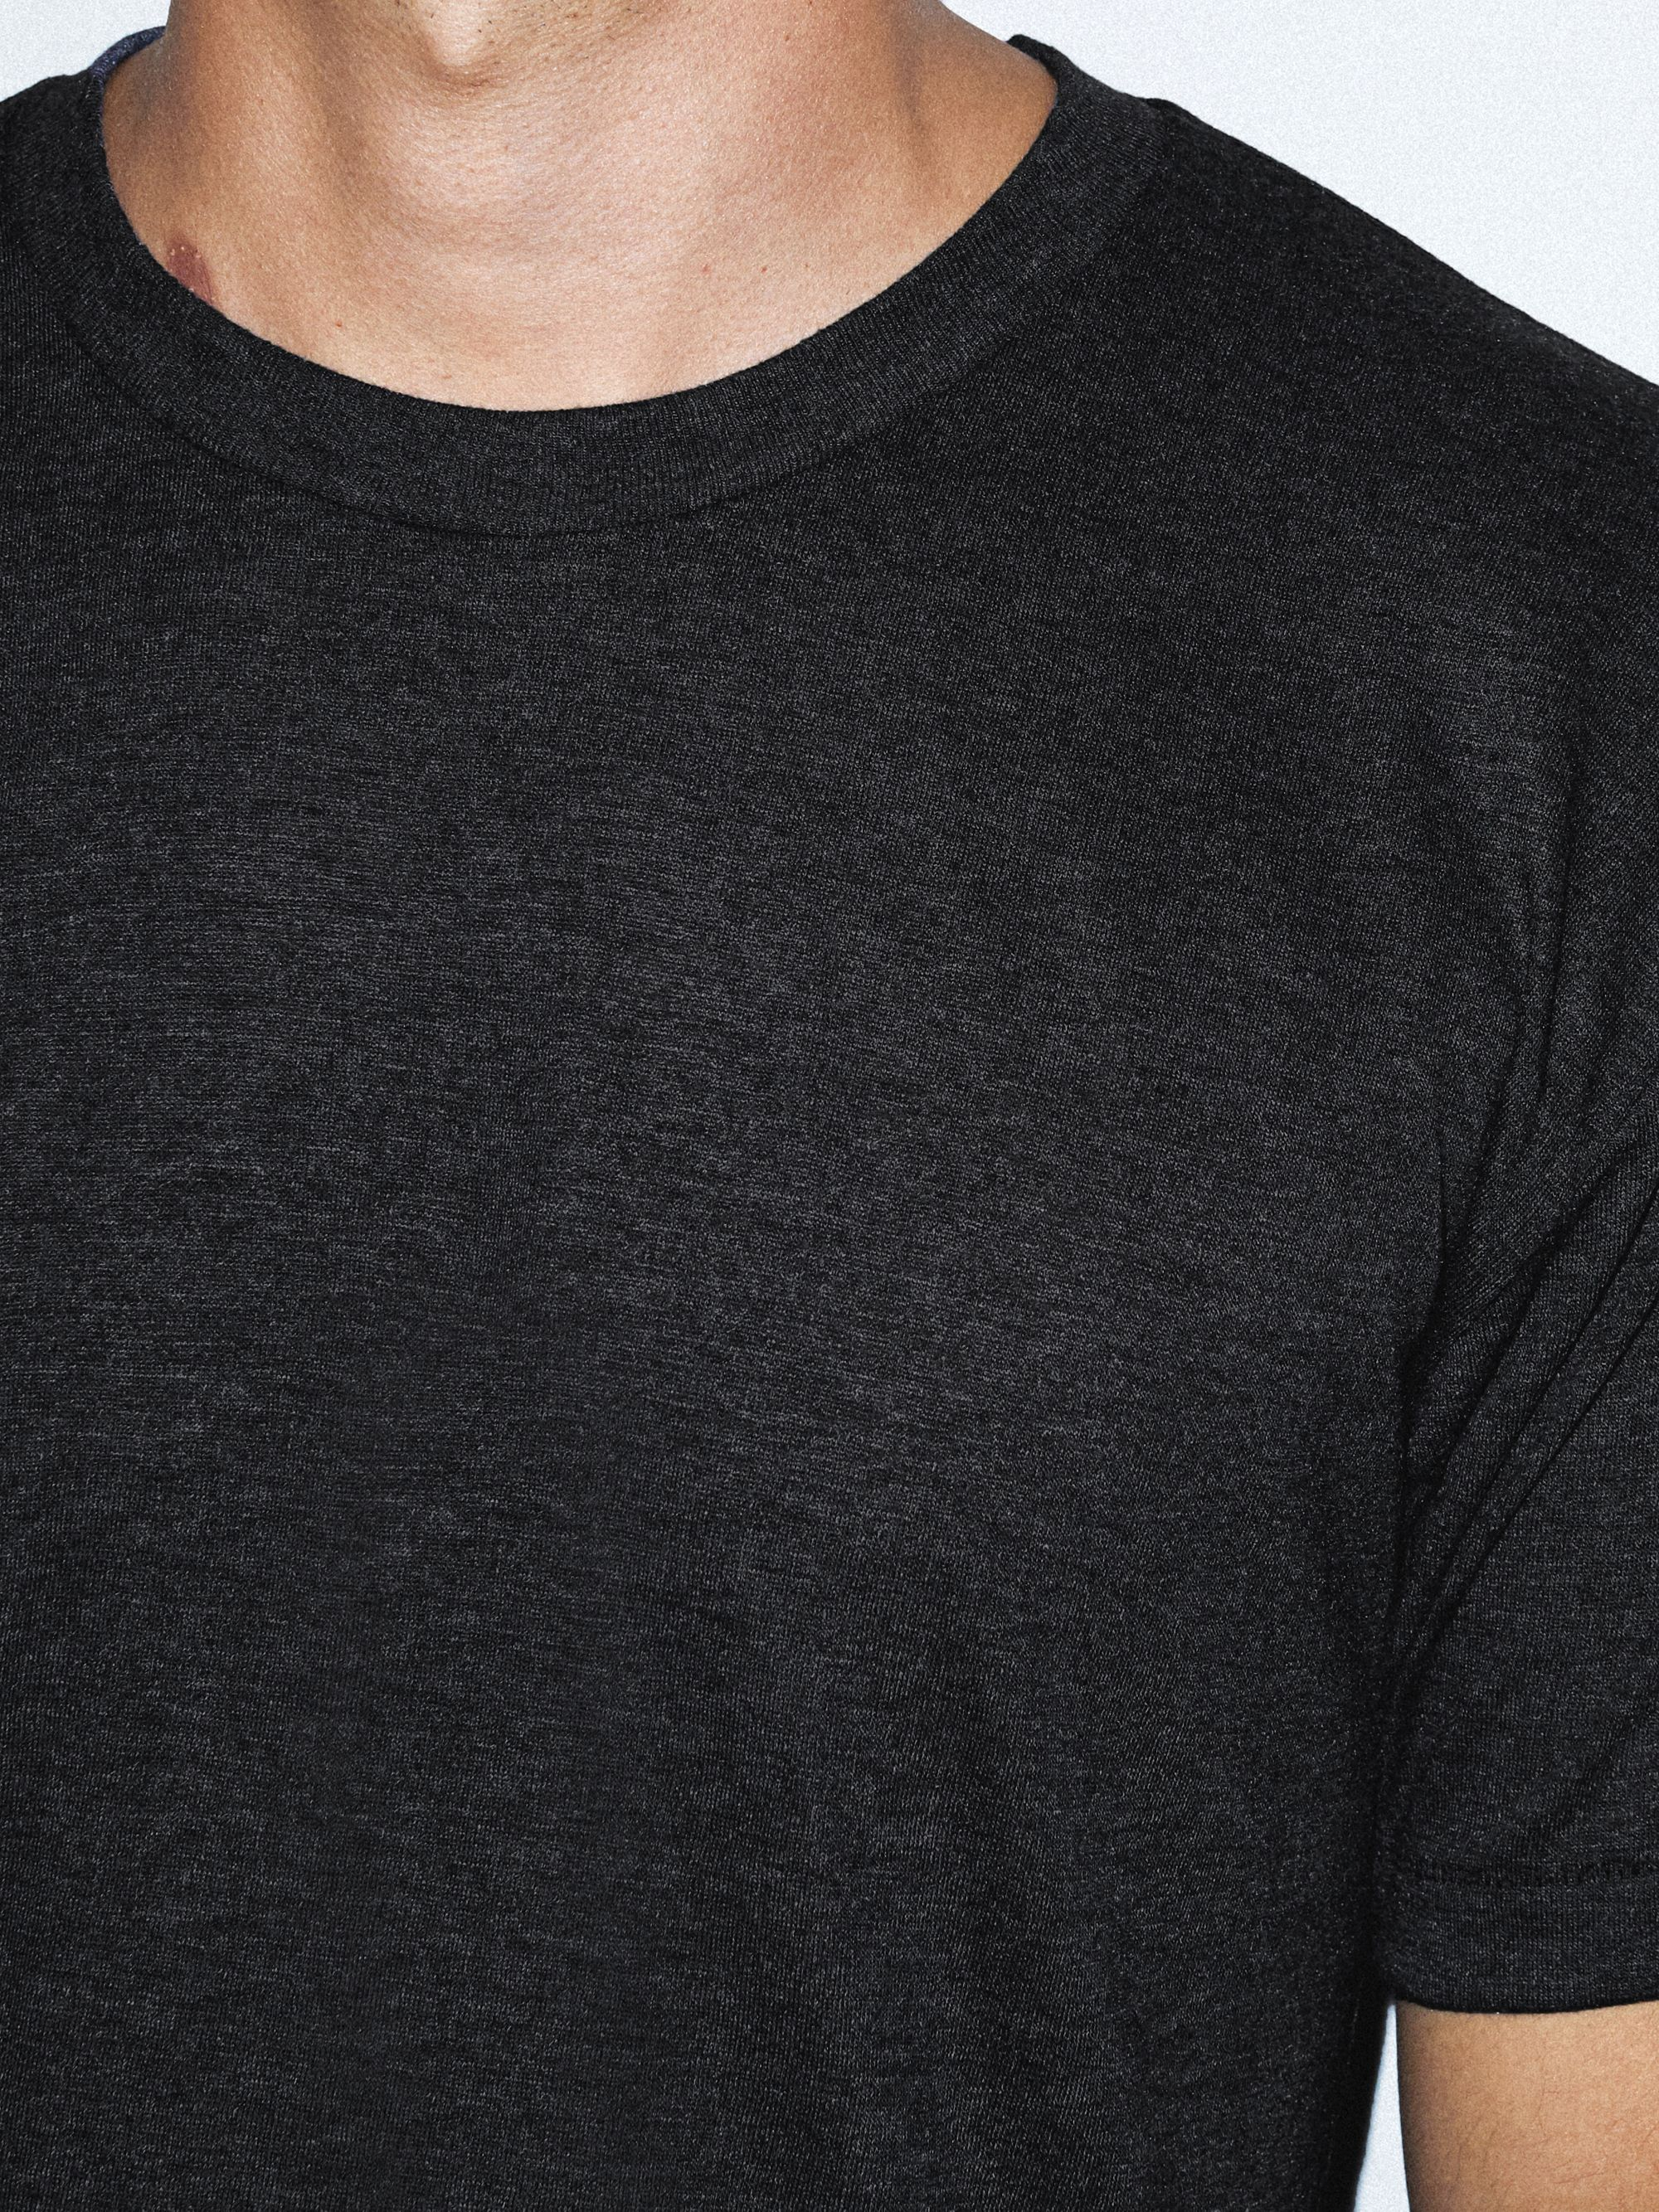 a591677b Tri-Blend Crewneck Track T-Shirt   American Apparel